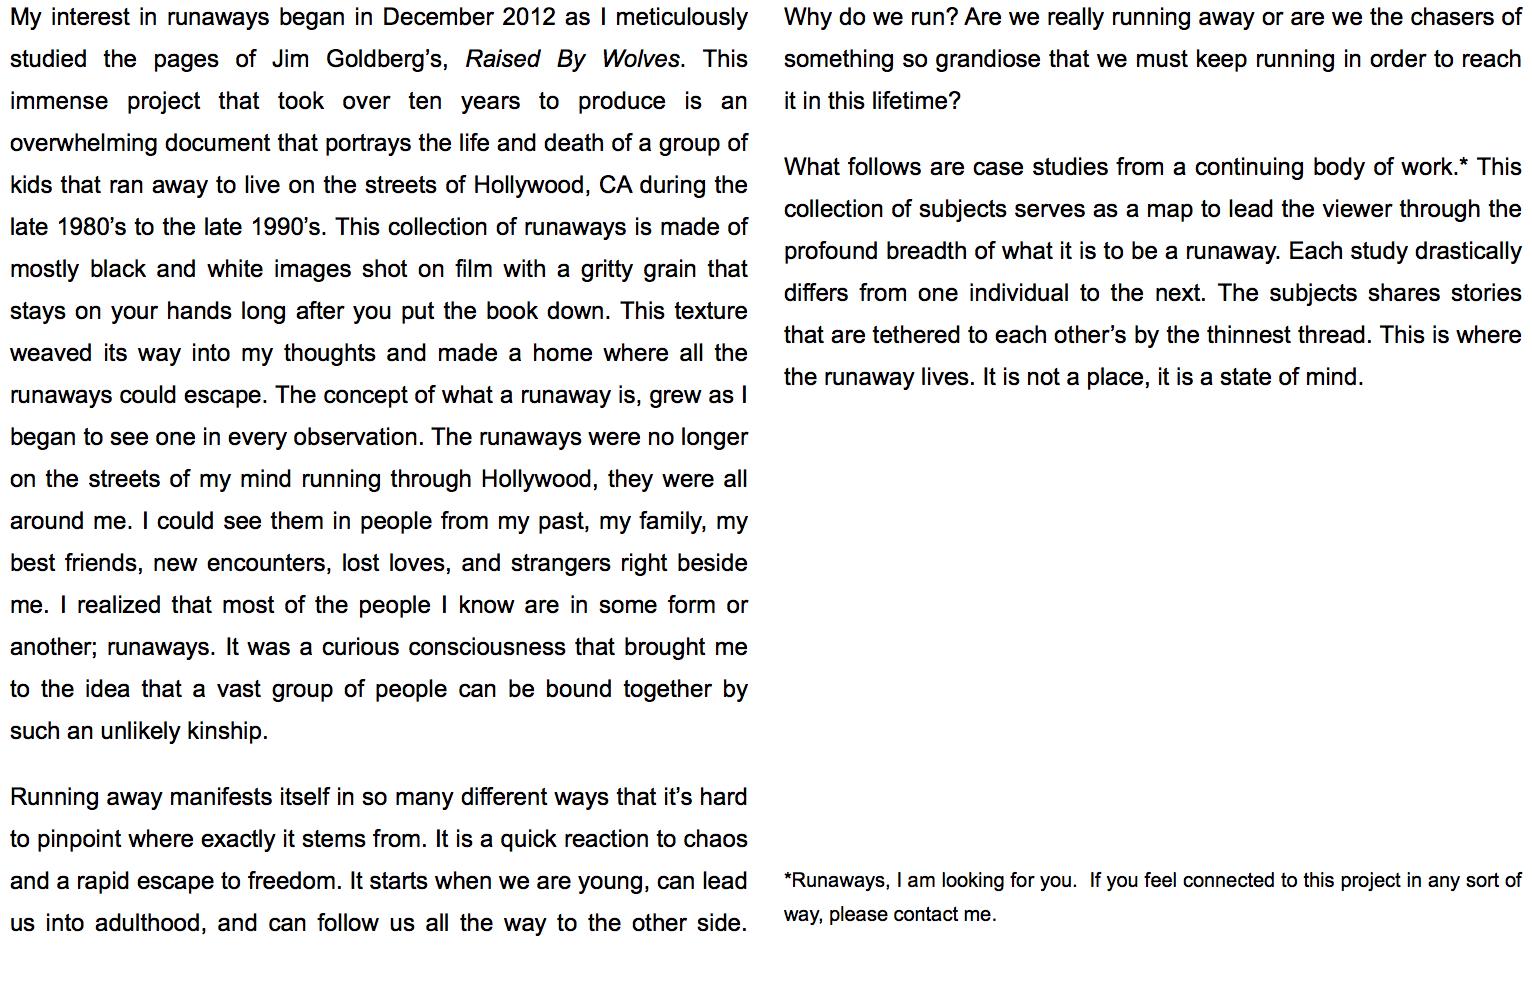 an excerpt from my piece on Runaways.